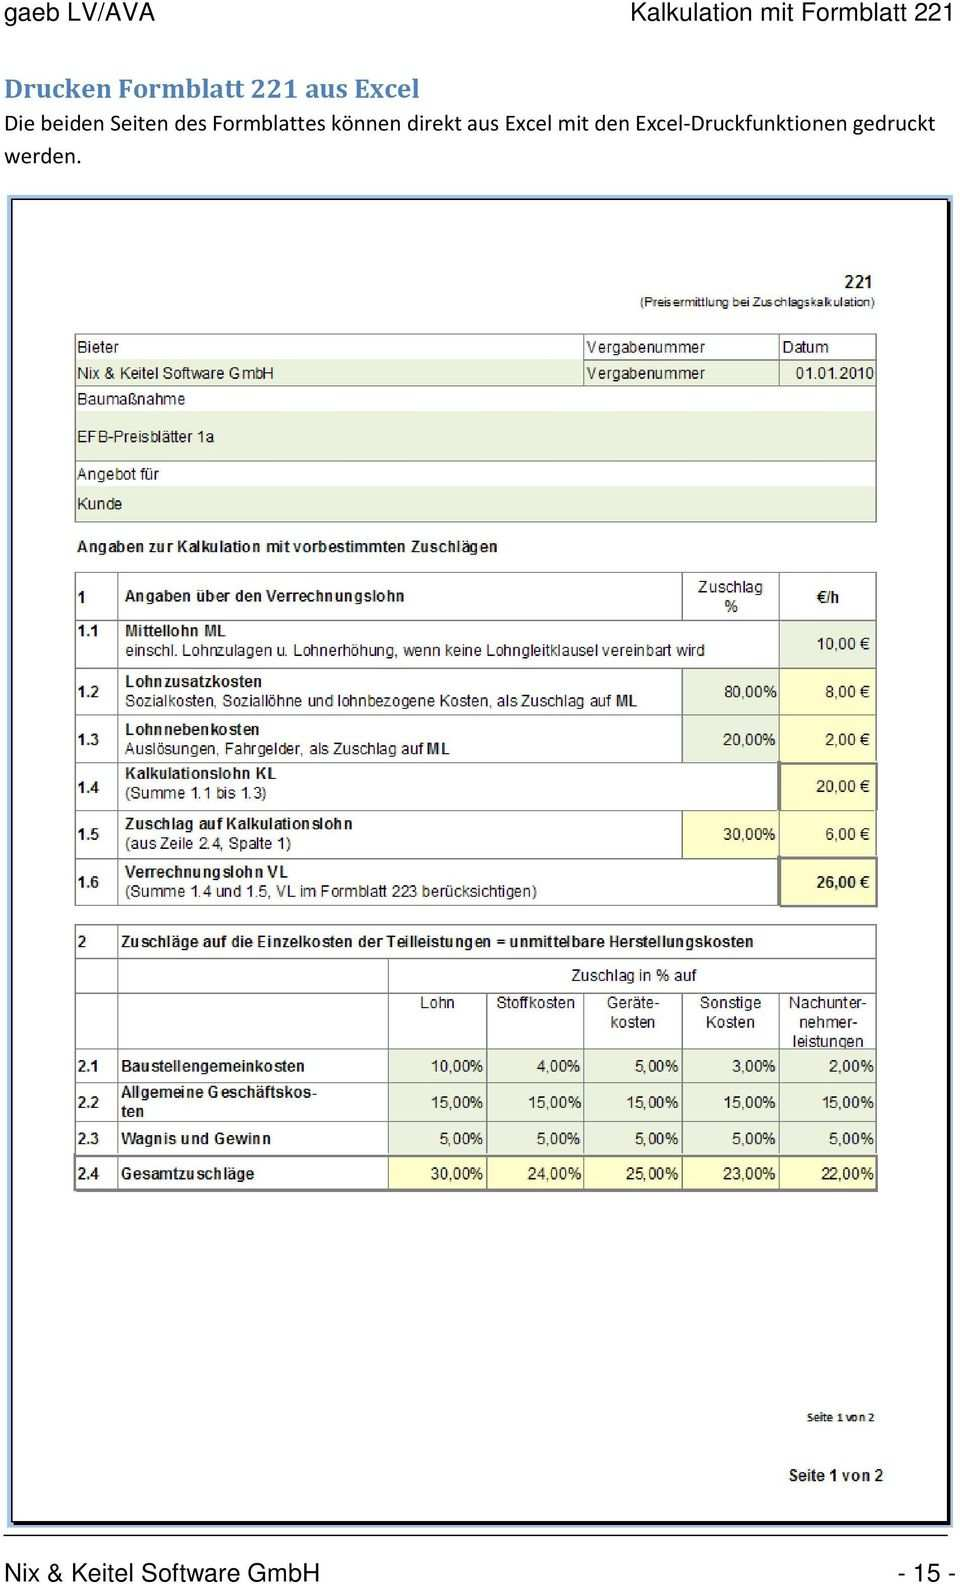 Gaeb Lv Ava Kalkulation Mit Formblatt 221 Gaeb Lv Ava Version 4 0